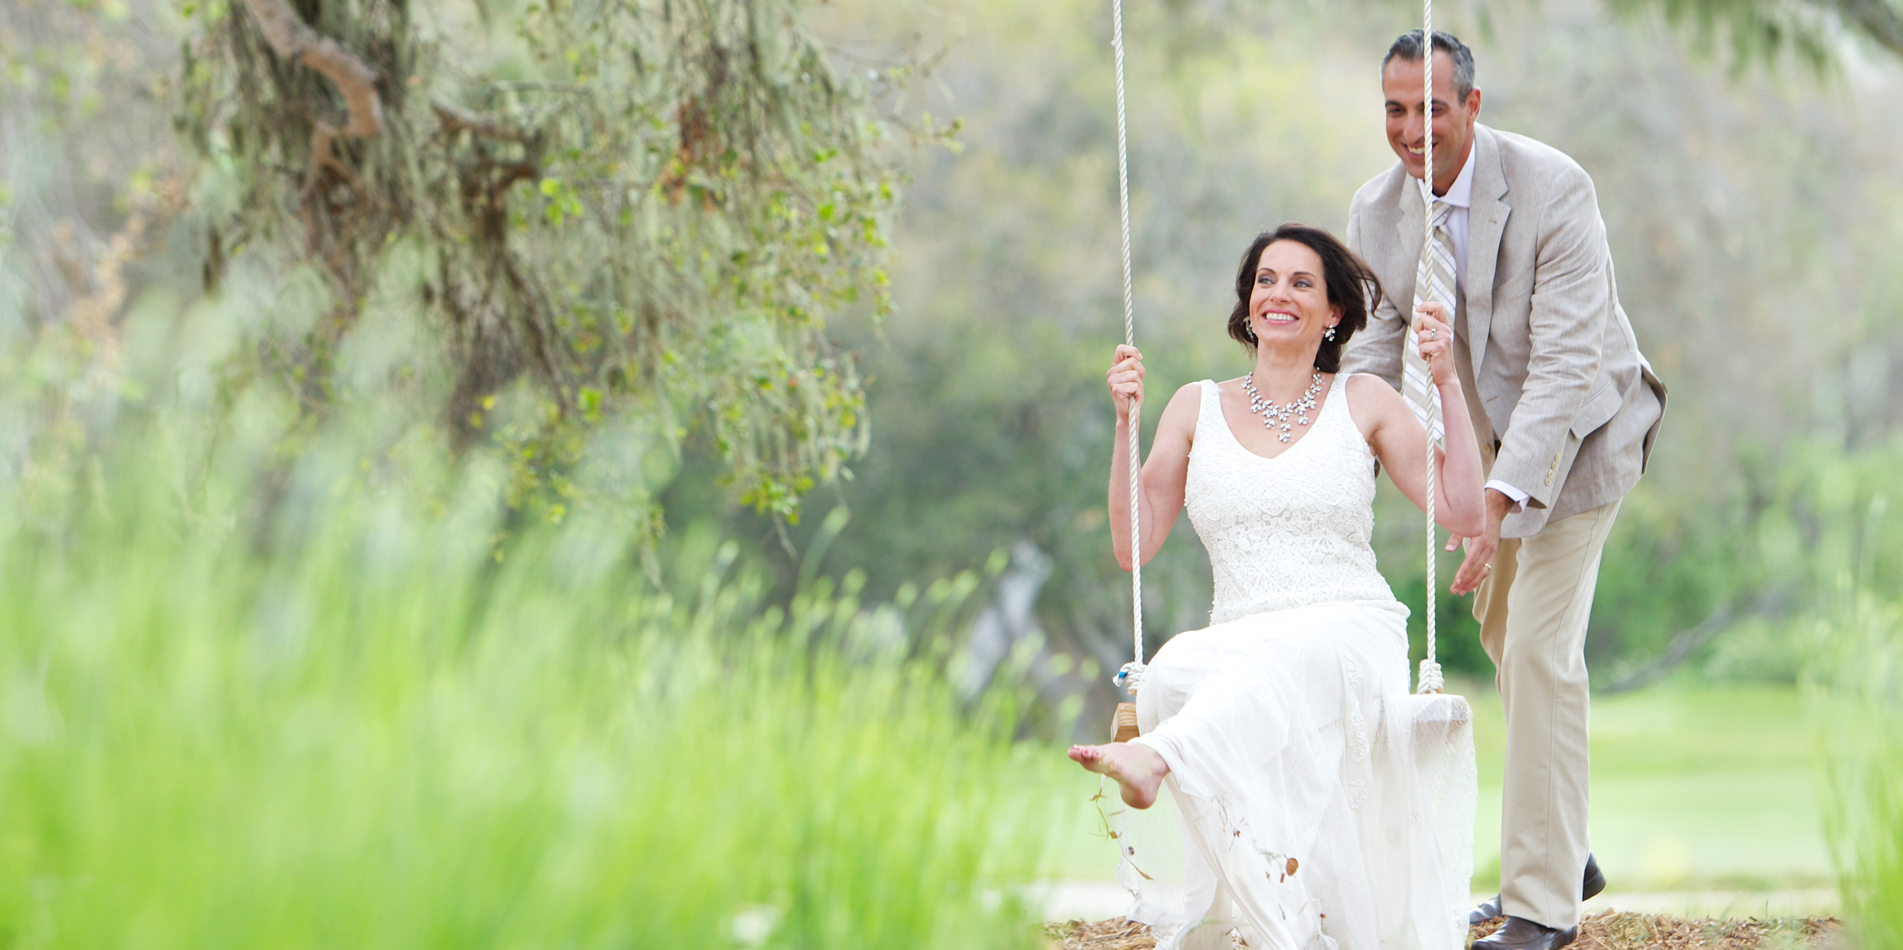 Carmel Valley Ranch_Weddigns_Swing_bride and groom fun swinging